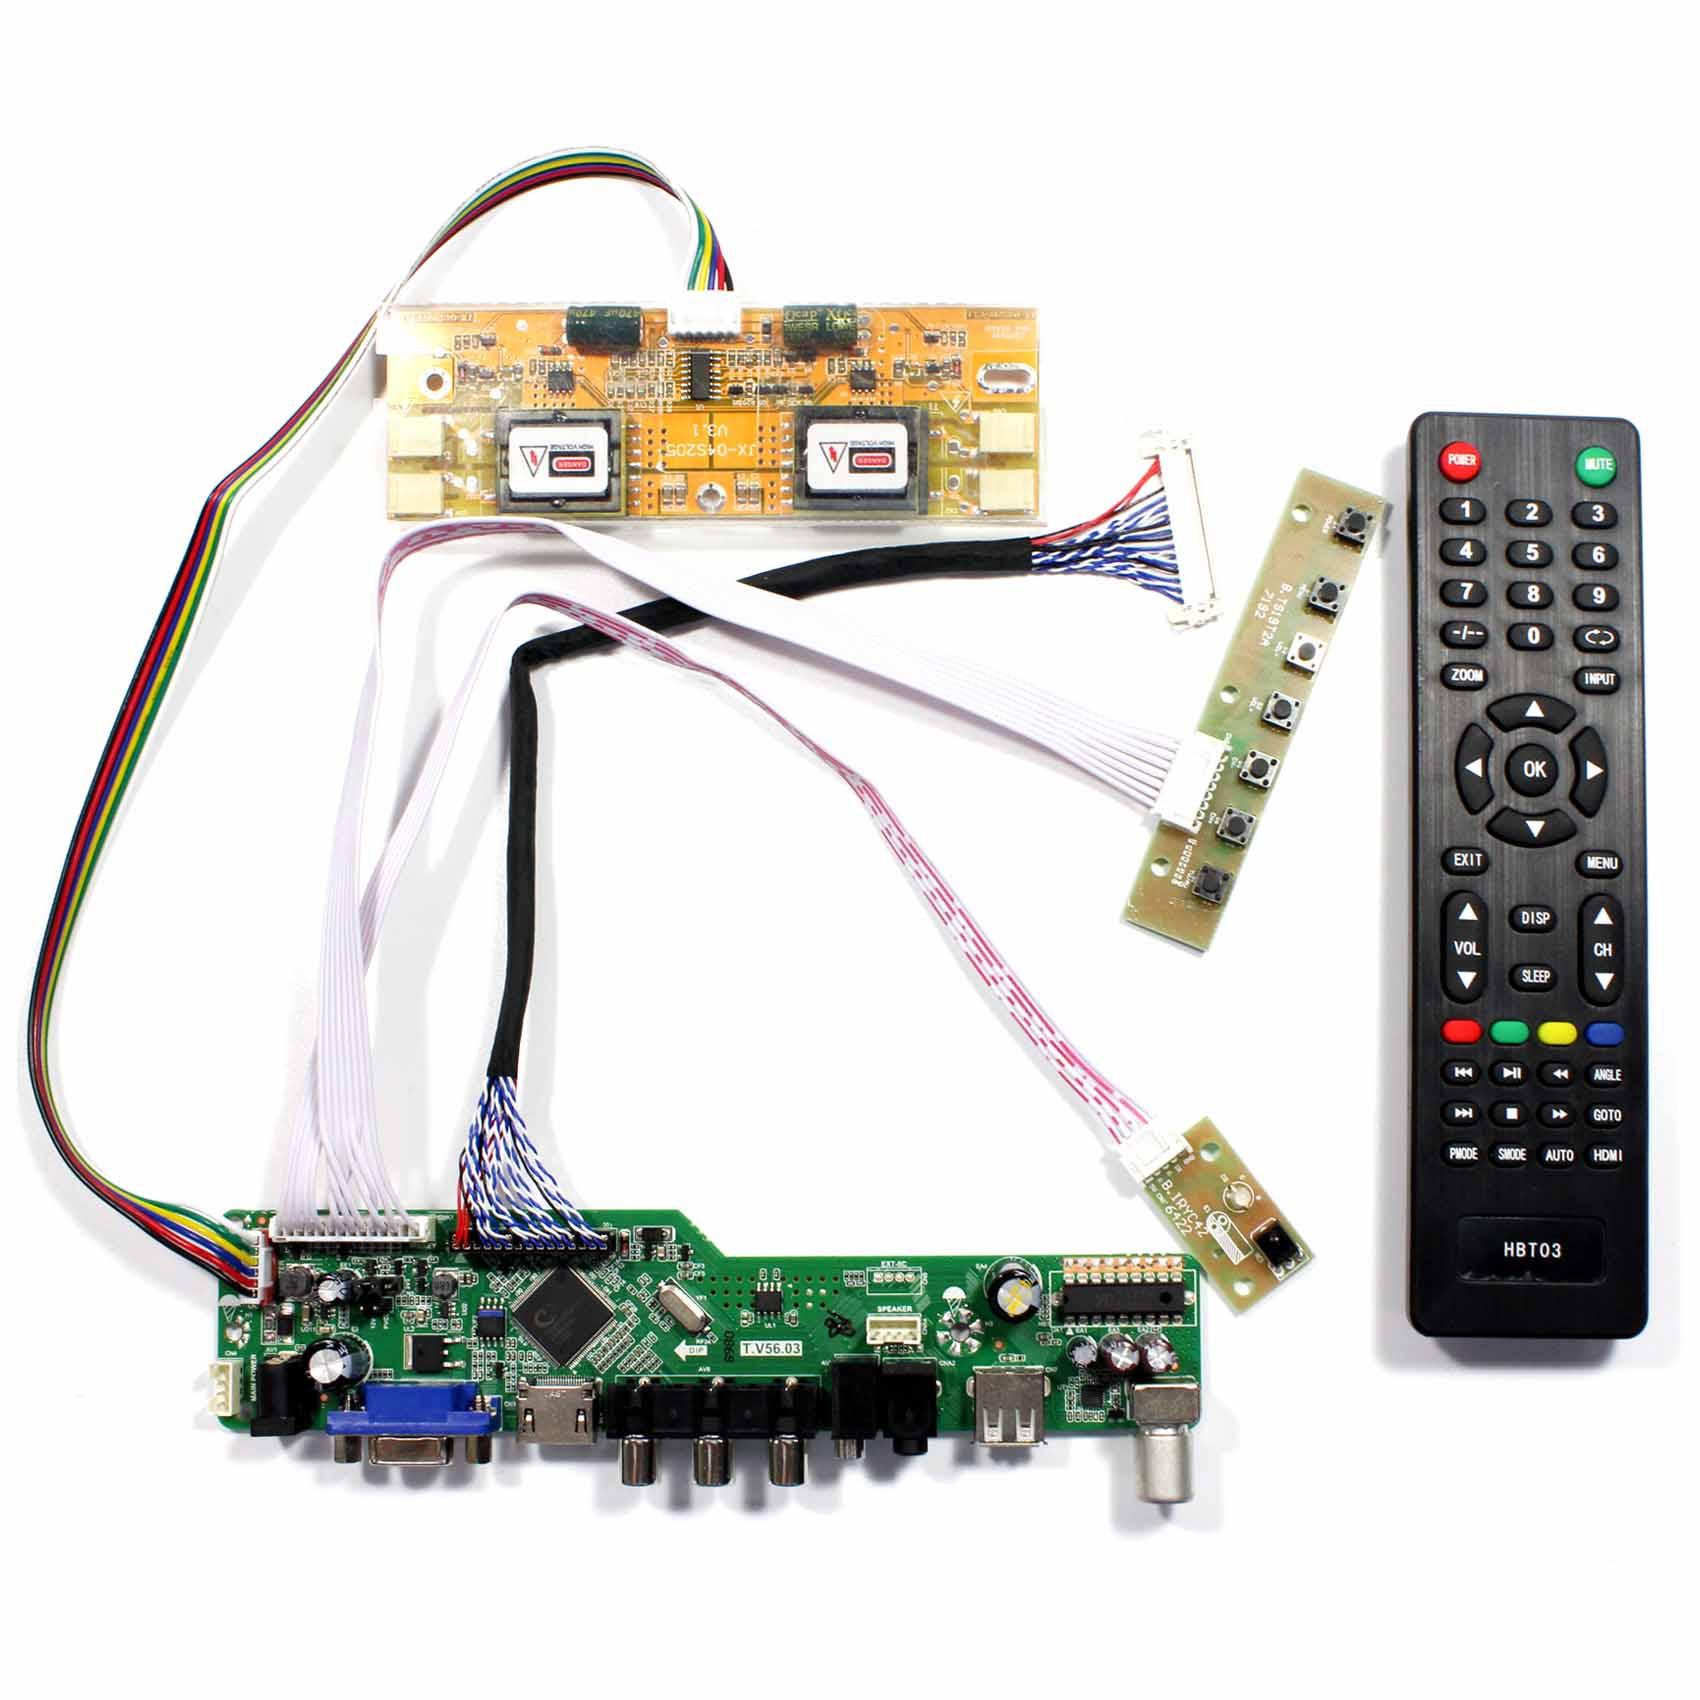 ТВ HDMI VGA AV USB аудио ЖК-дисплей плате контроллера для 20,1 22 M201EW02 V1 M201EW02 V8 M201EW02 V9 M220EW01 1680x1050 ЖК-дисплей Экран